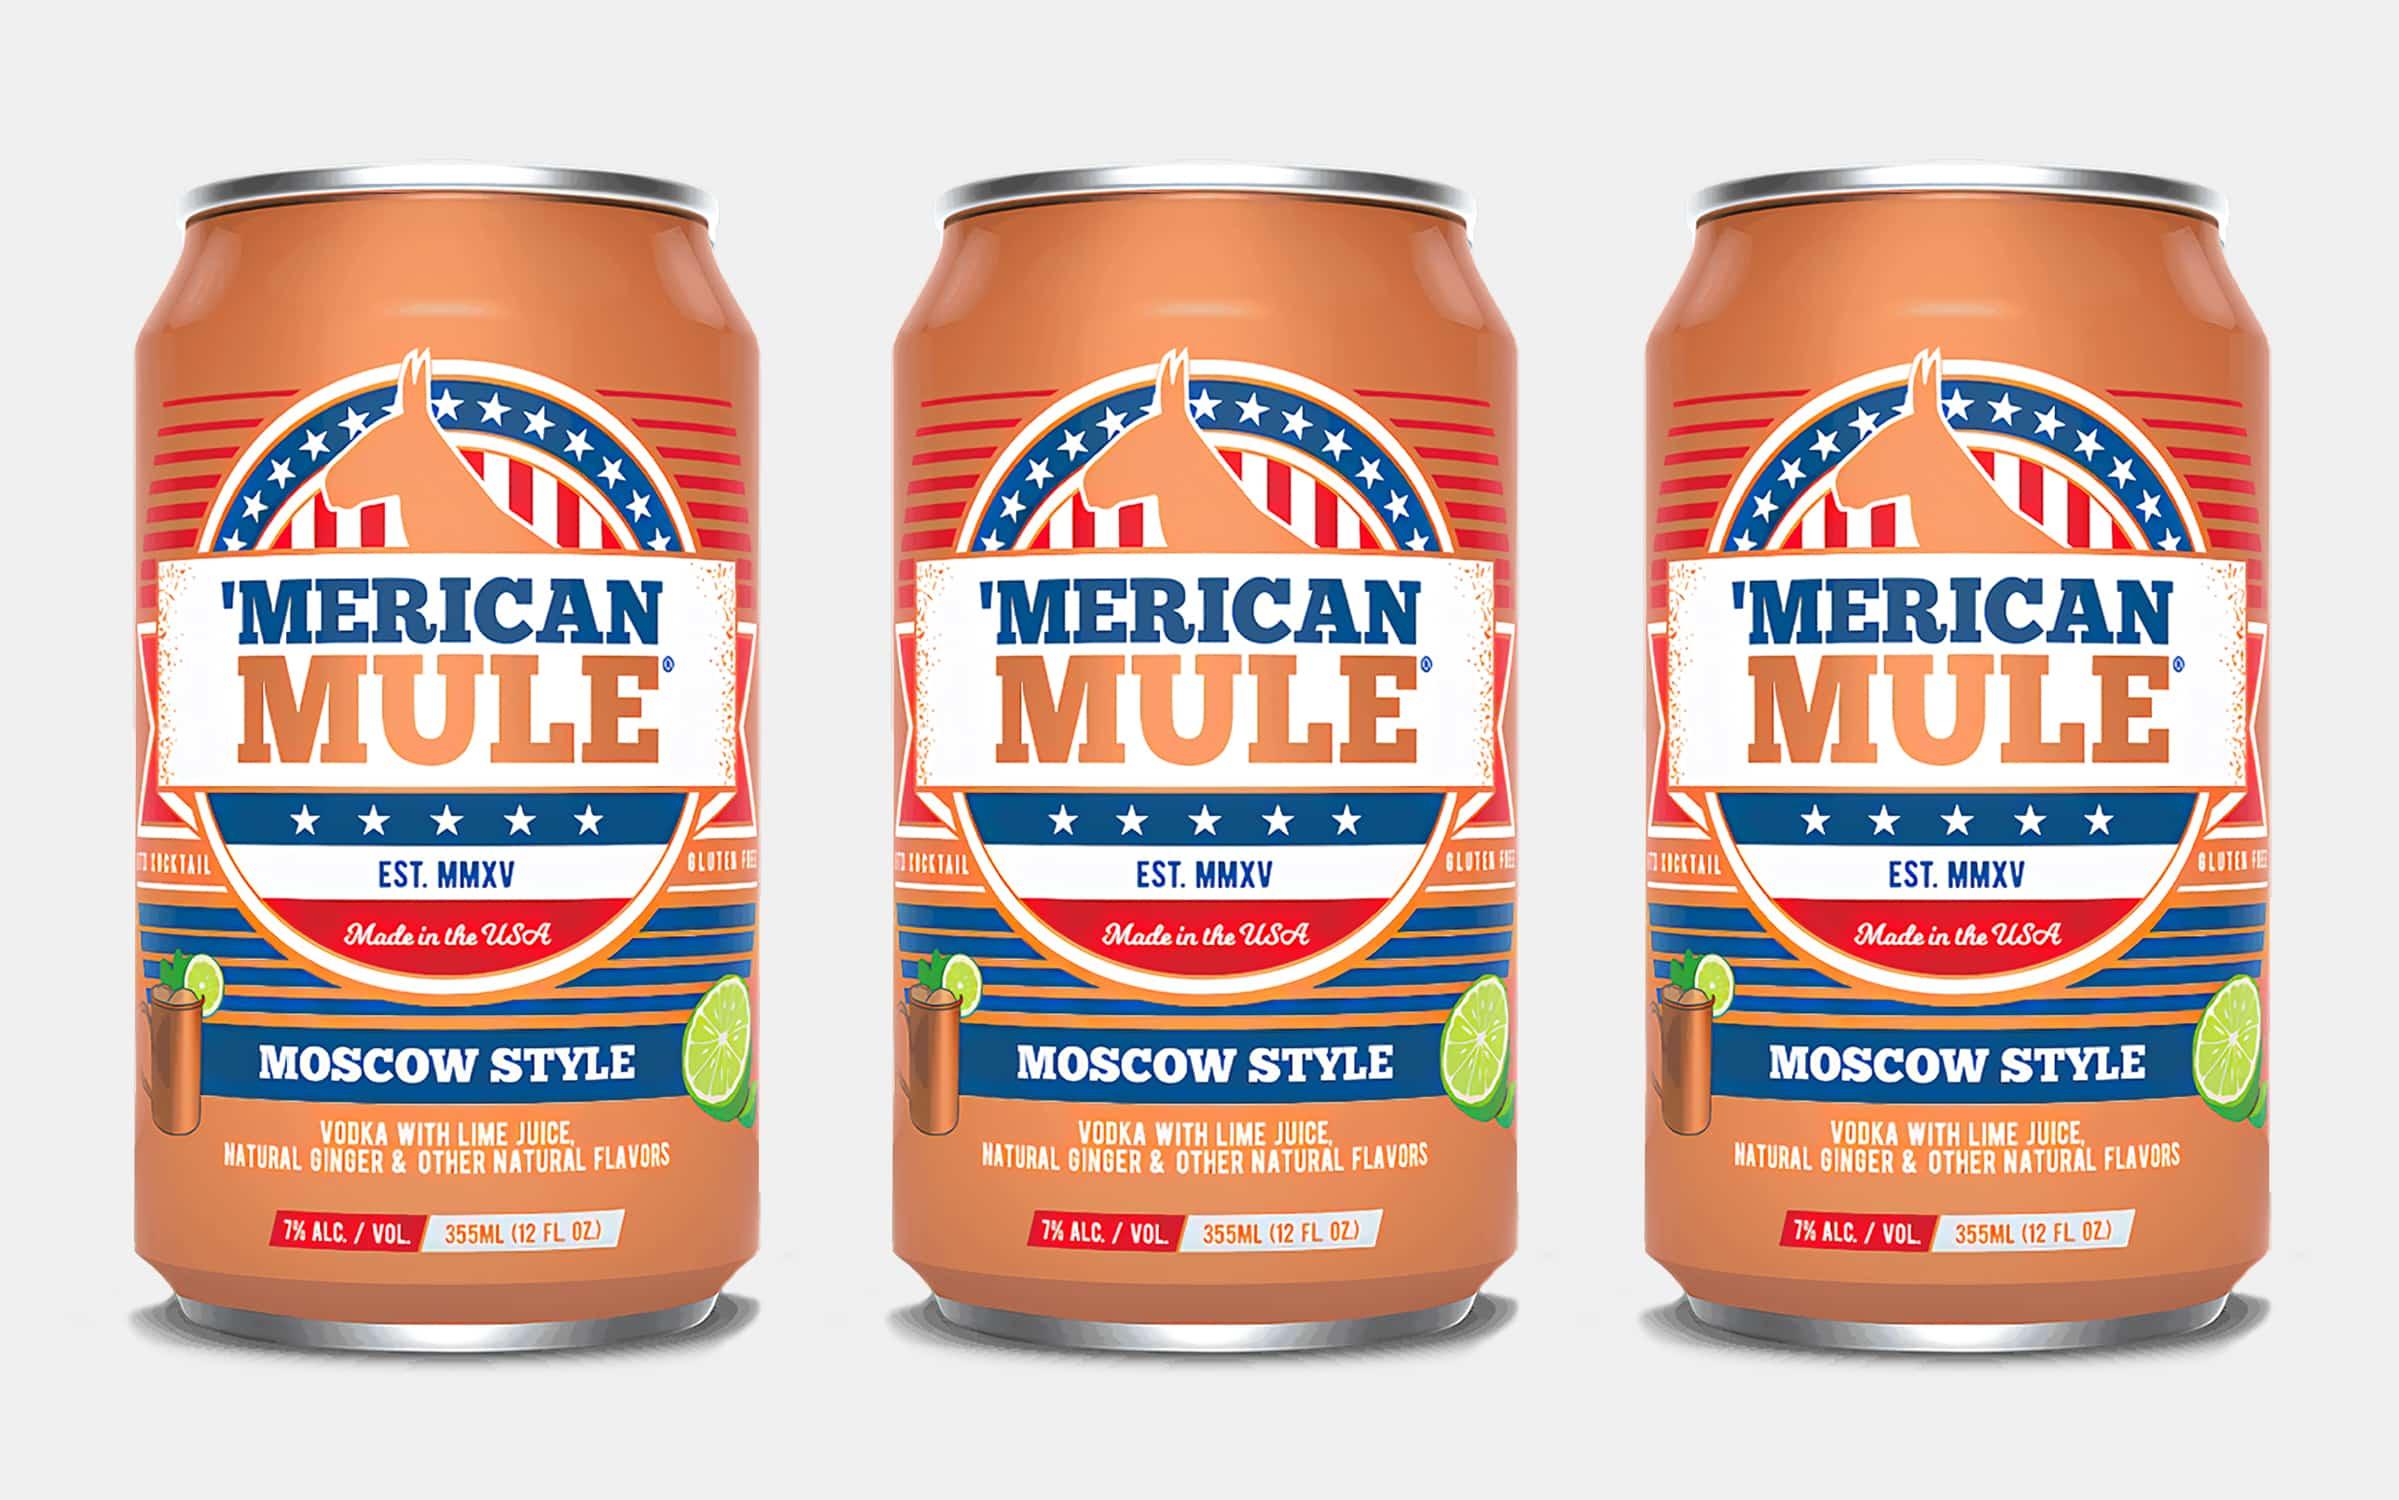 'Merican Mule Canned Moscow Mule